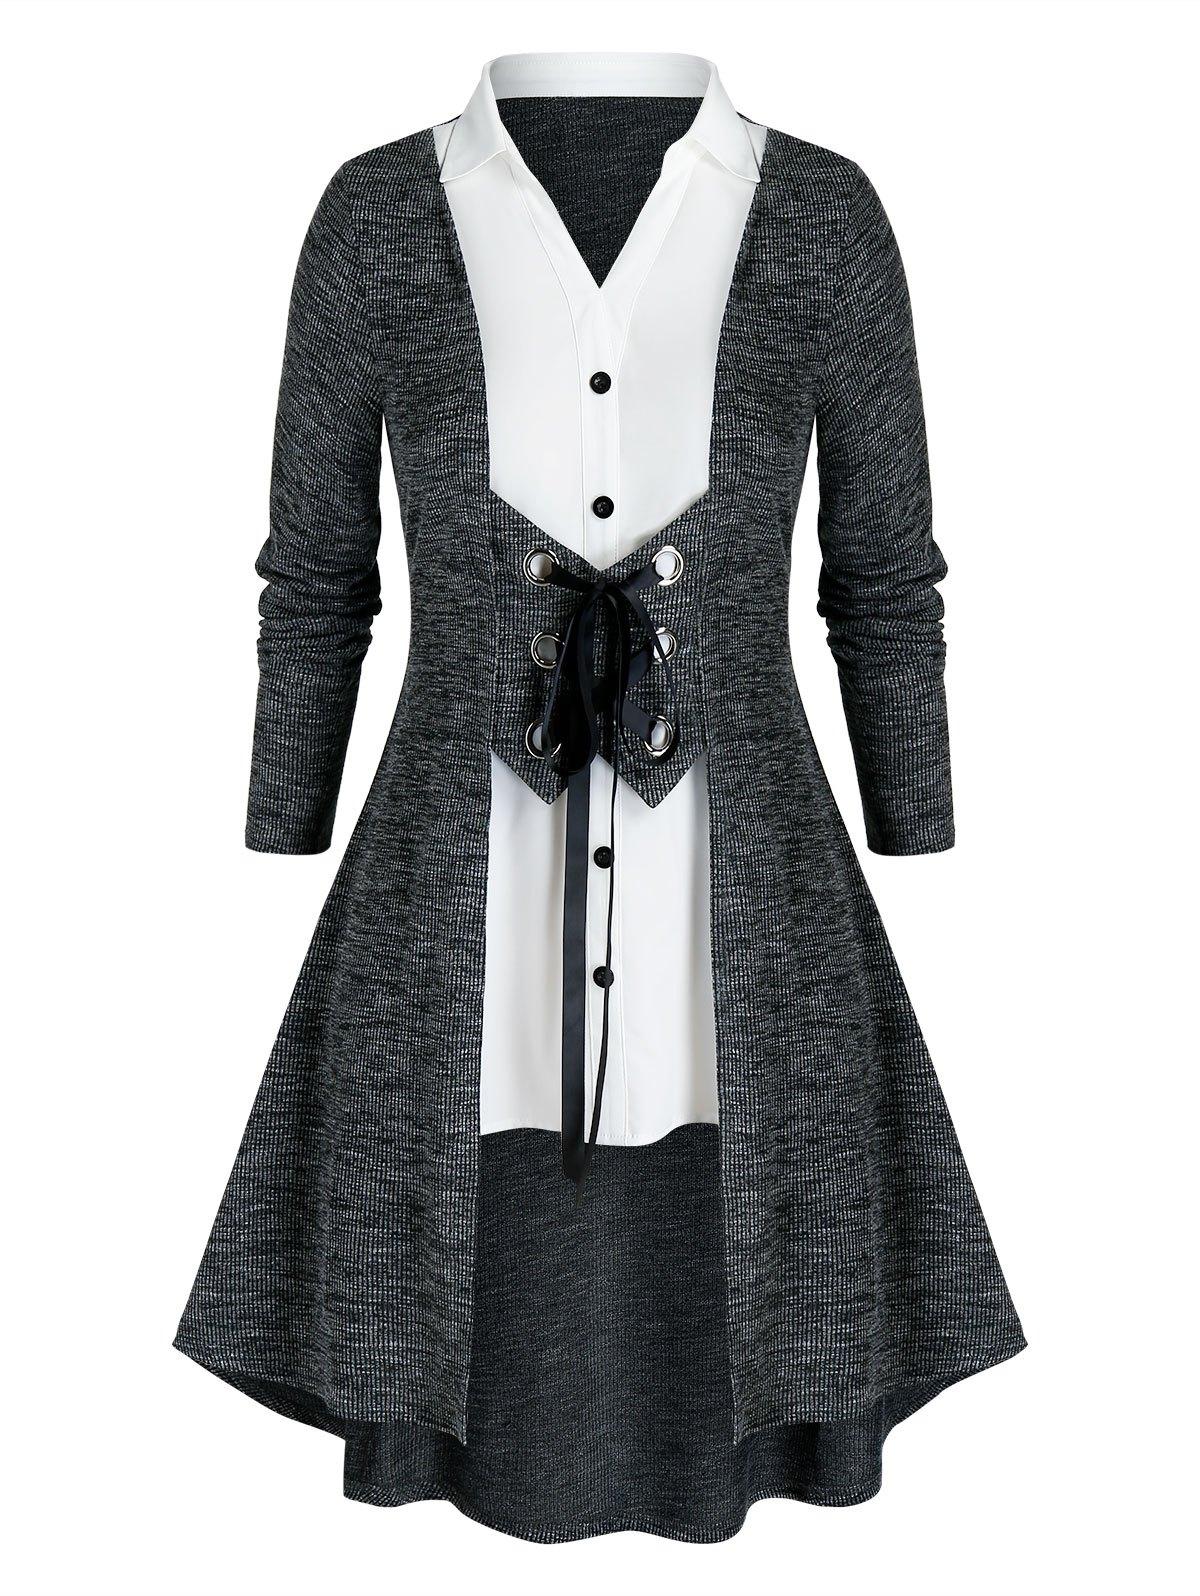 Plus Size Grommet Lace-up 2 In 1 Long Knit Cardigan